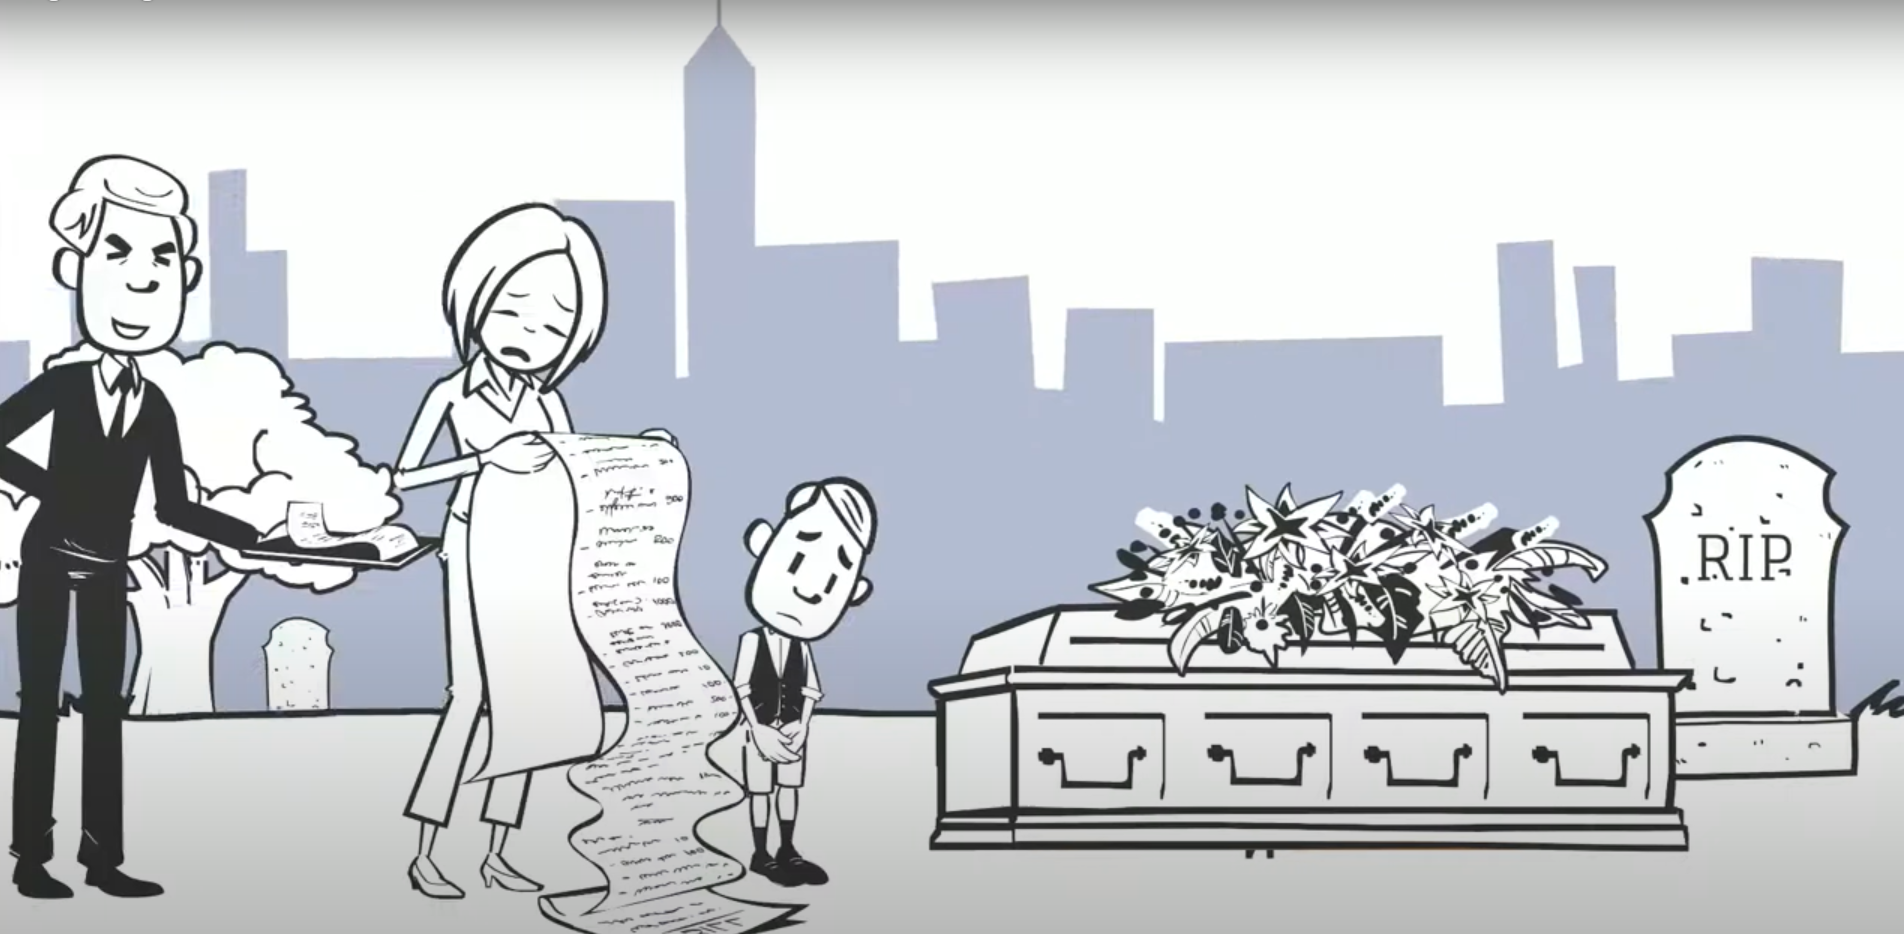 Spese funebri: Tutti i Costi da Affrontare per un funerale nel 2021